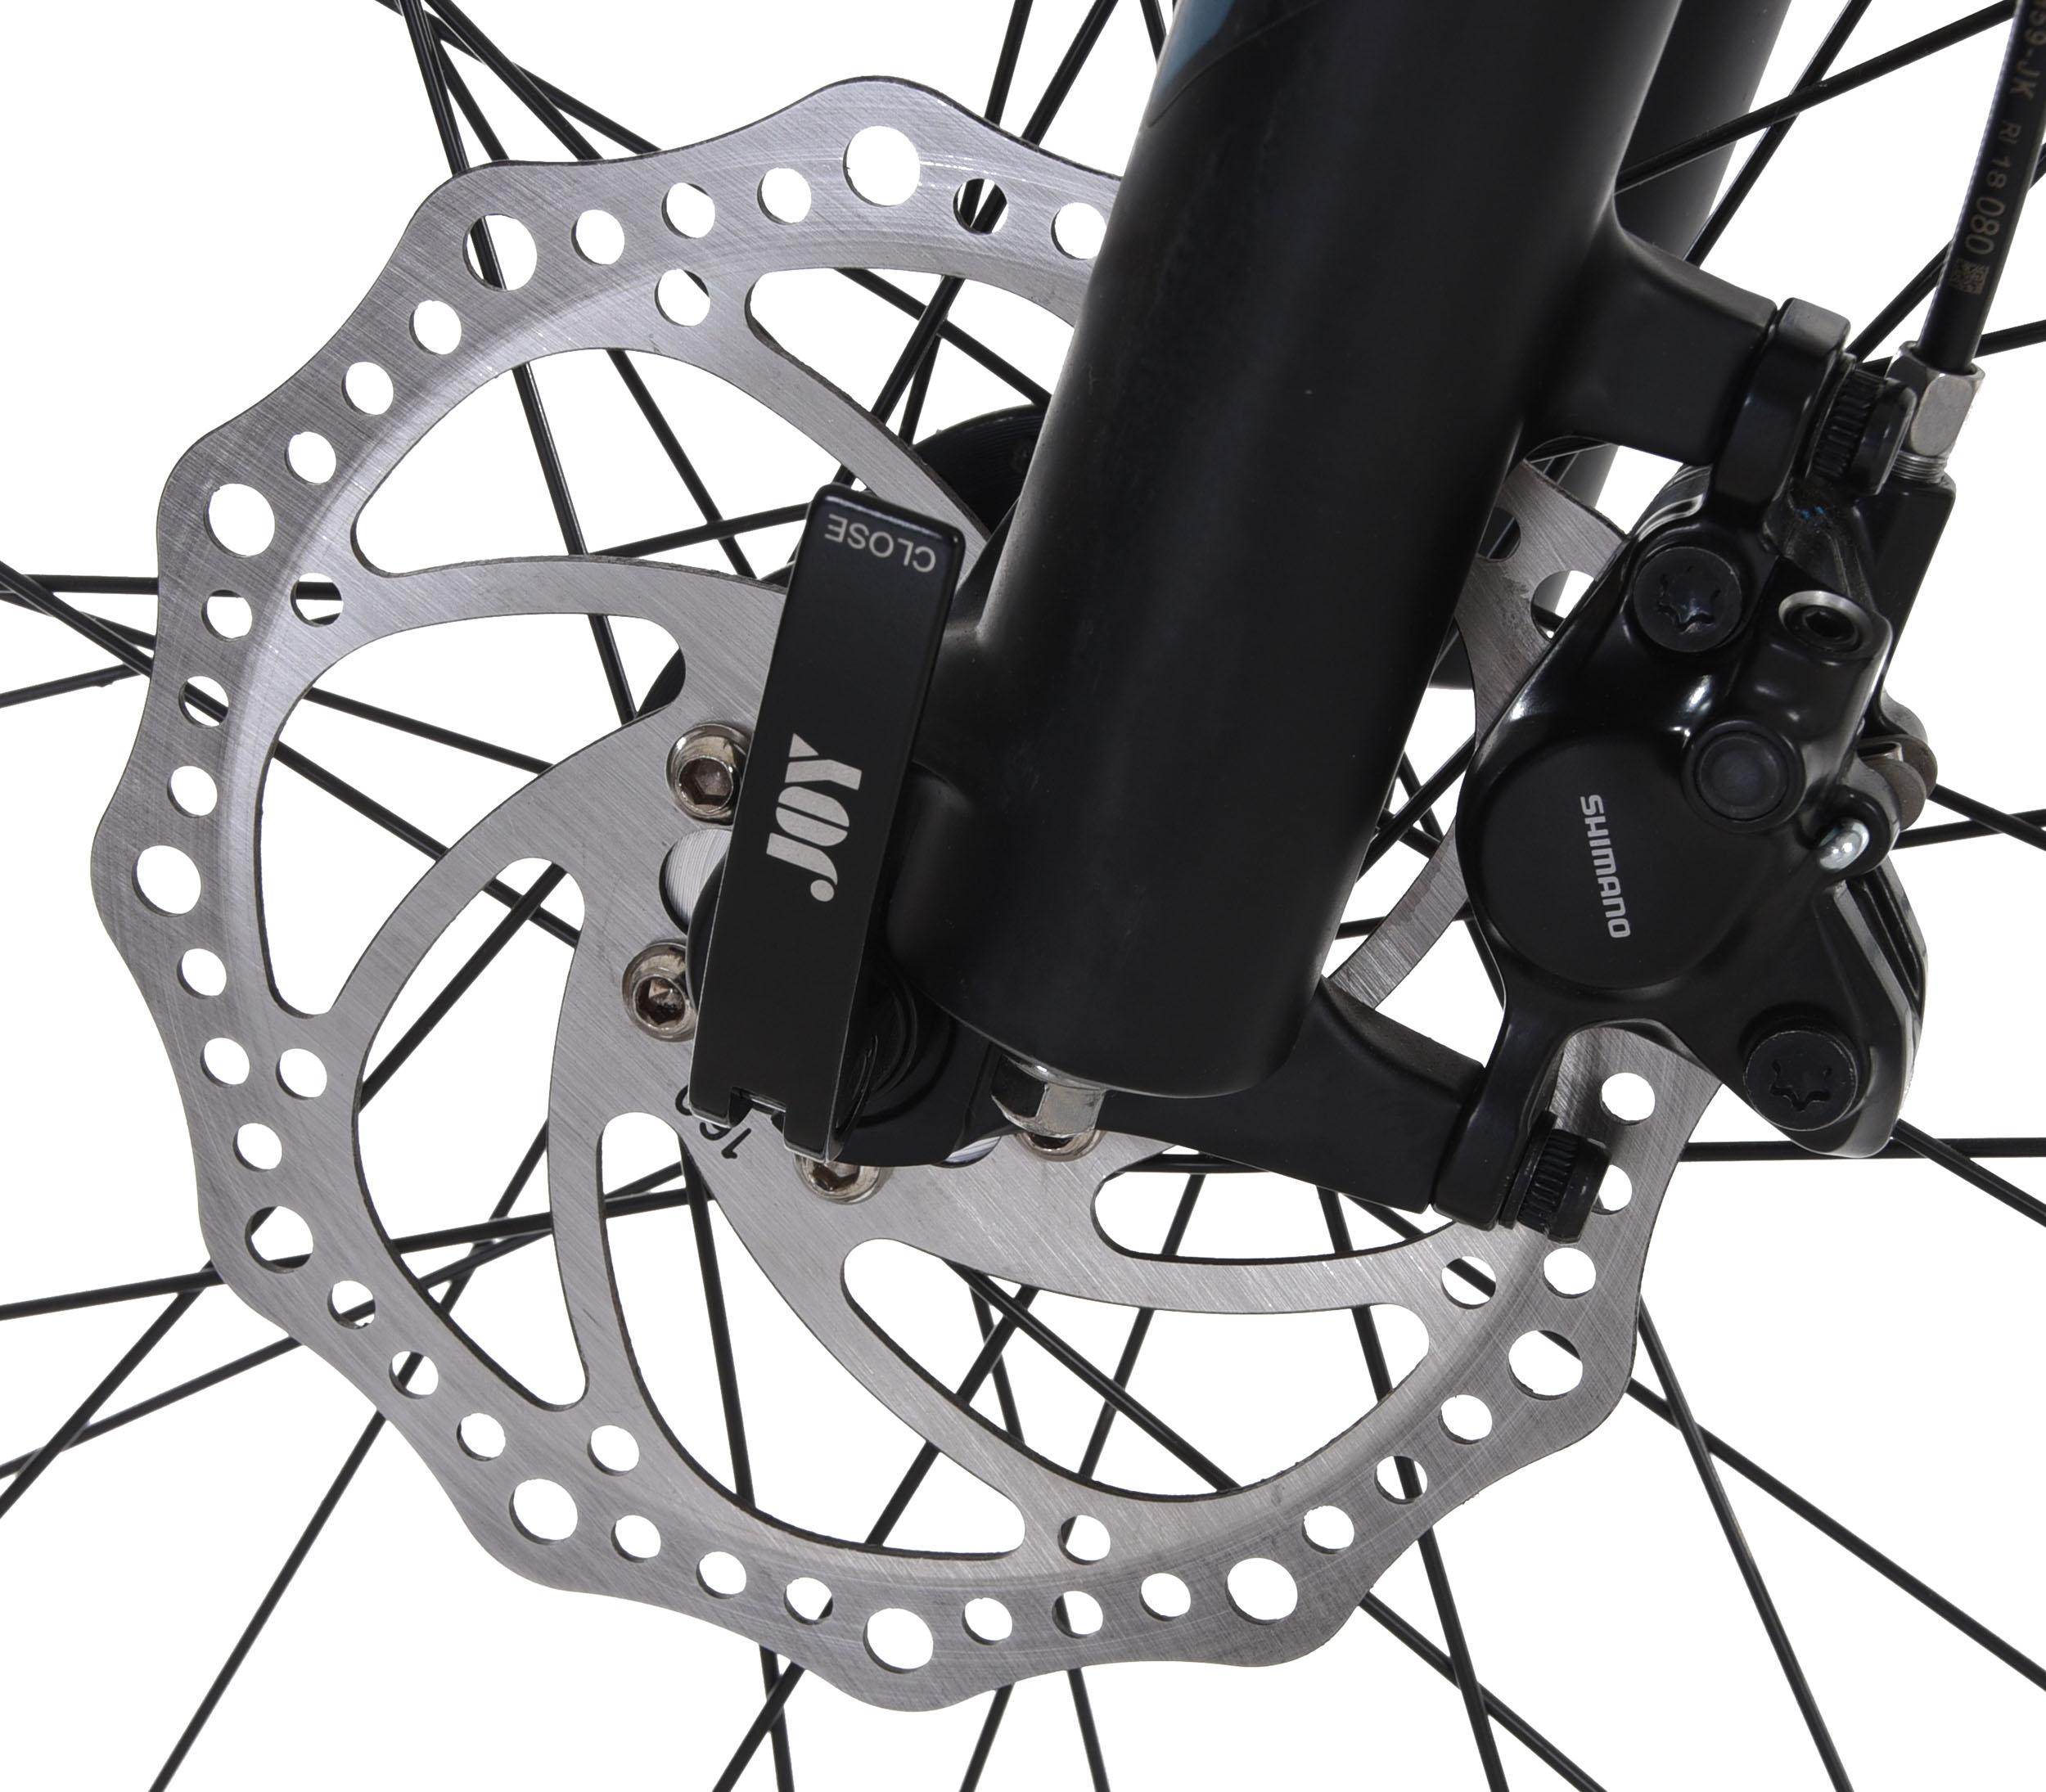 thumbnail 26 - COBRA 29er Mountain Bike 24 Speed MTB with 29-Inch Wheels